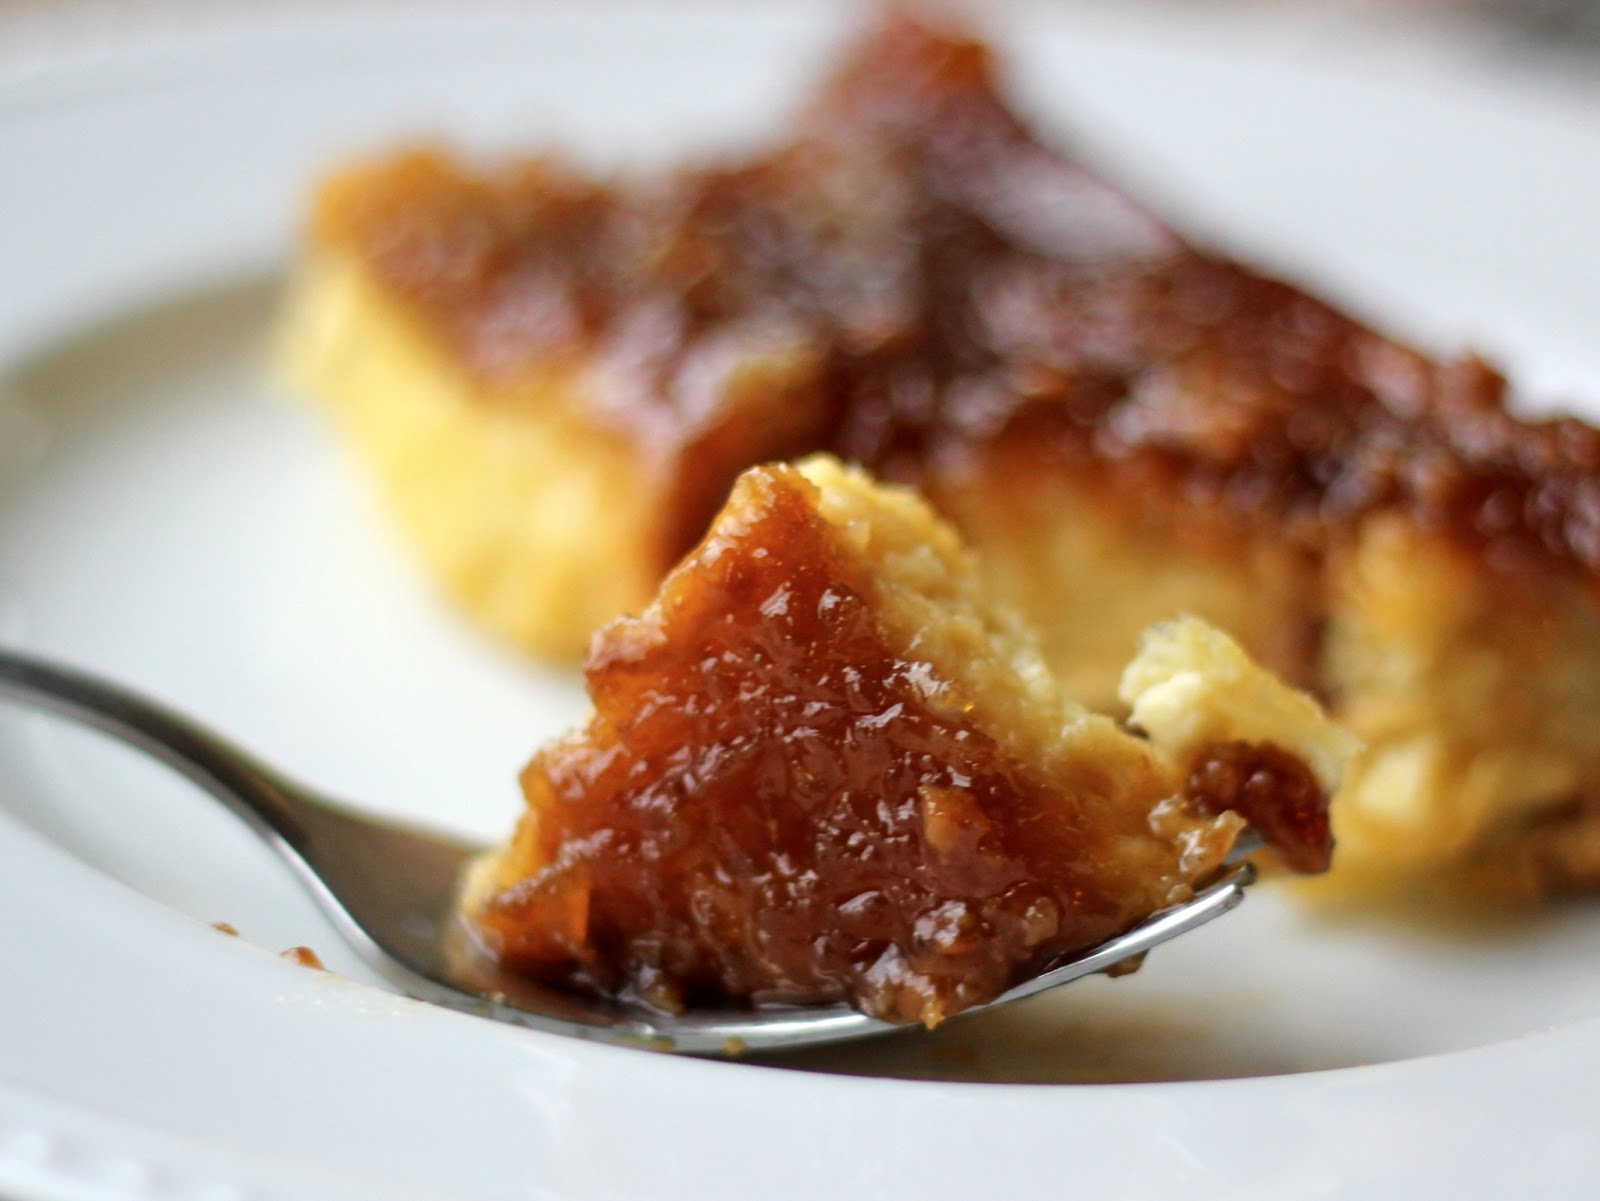 beurrista: crème brûlée french toast